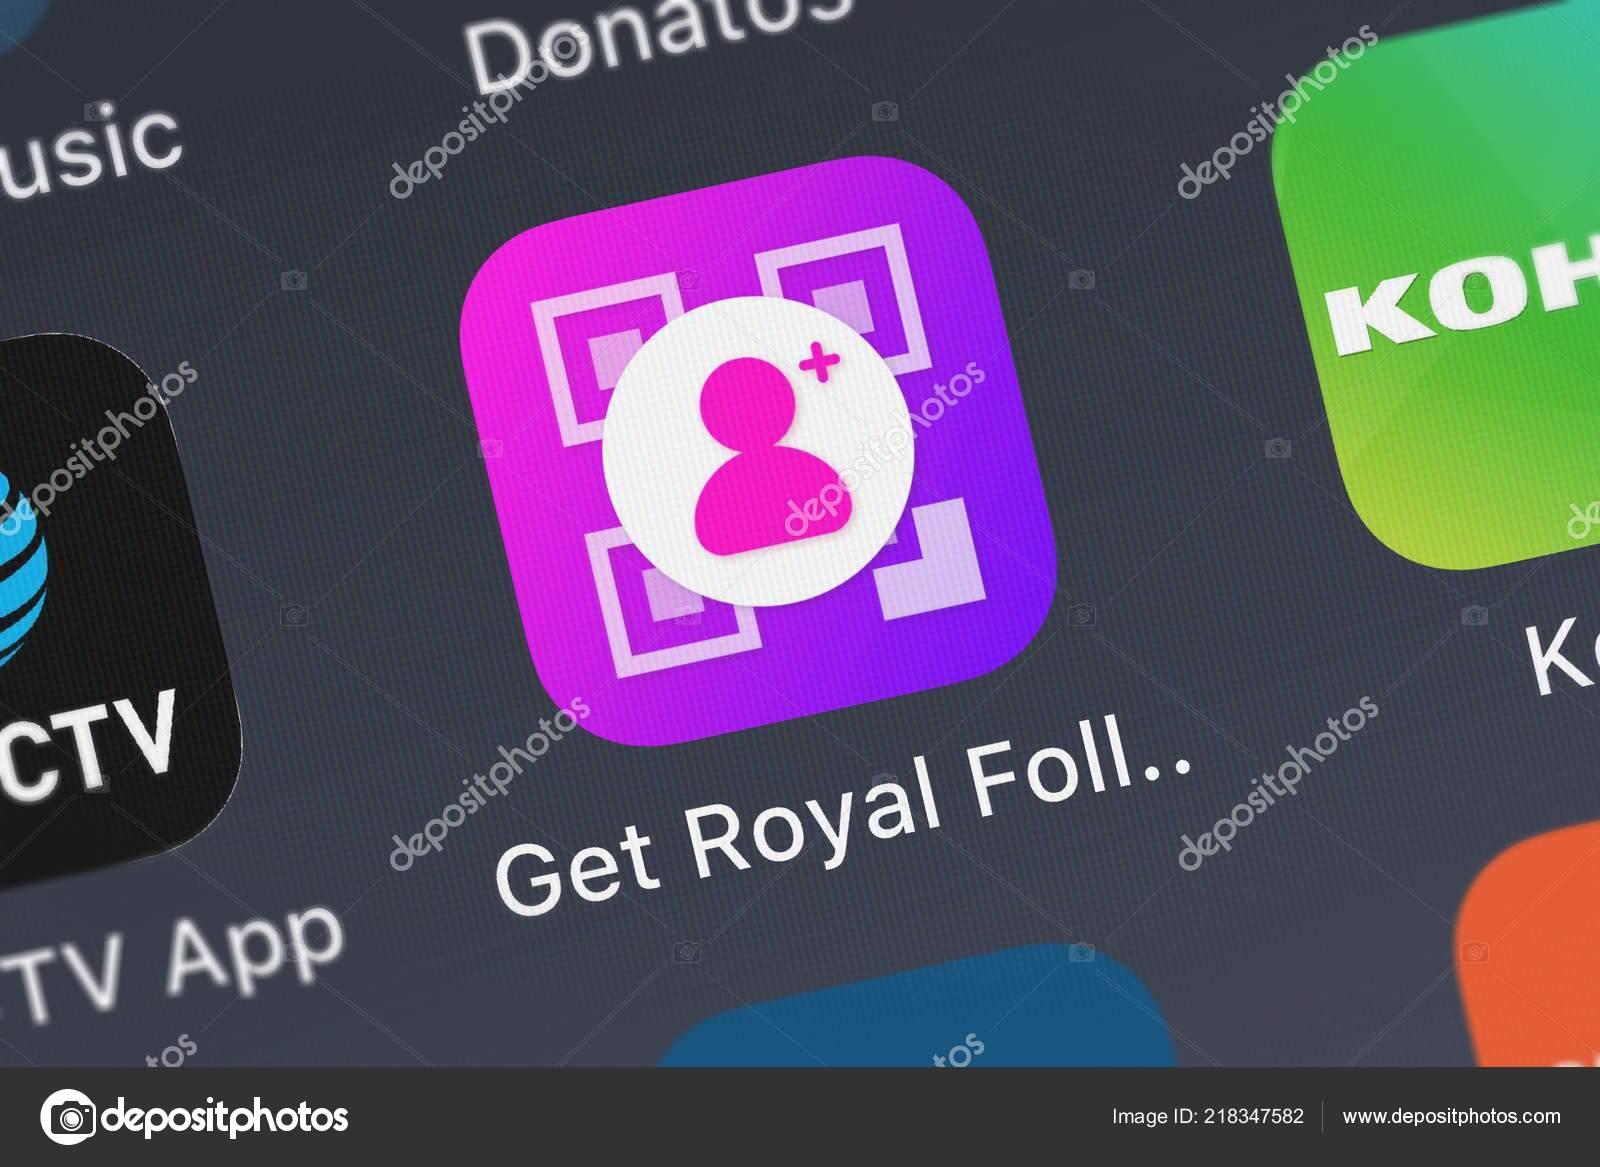 London United Kingdom October 2018 Icon Mobile App Get Royal